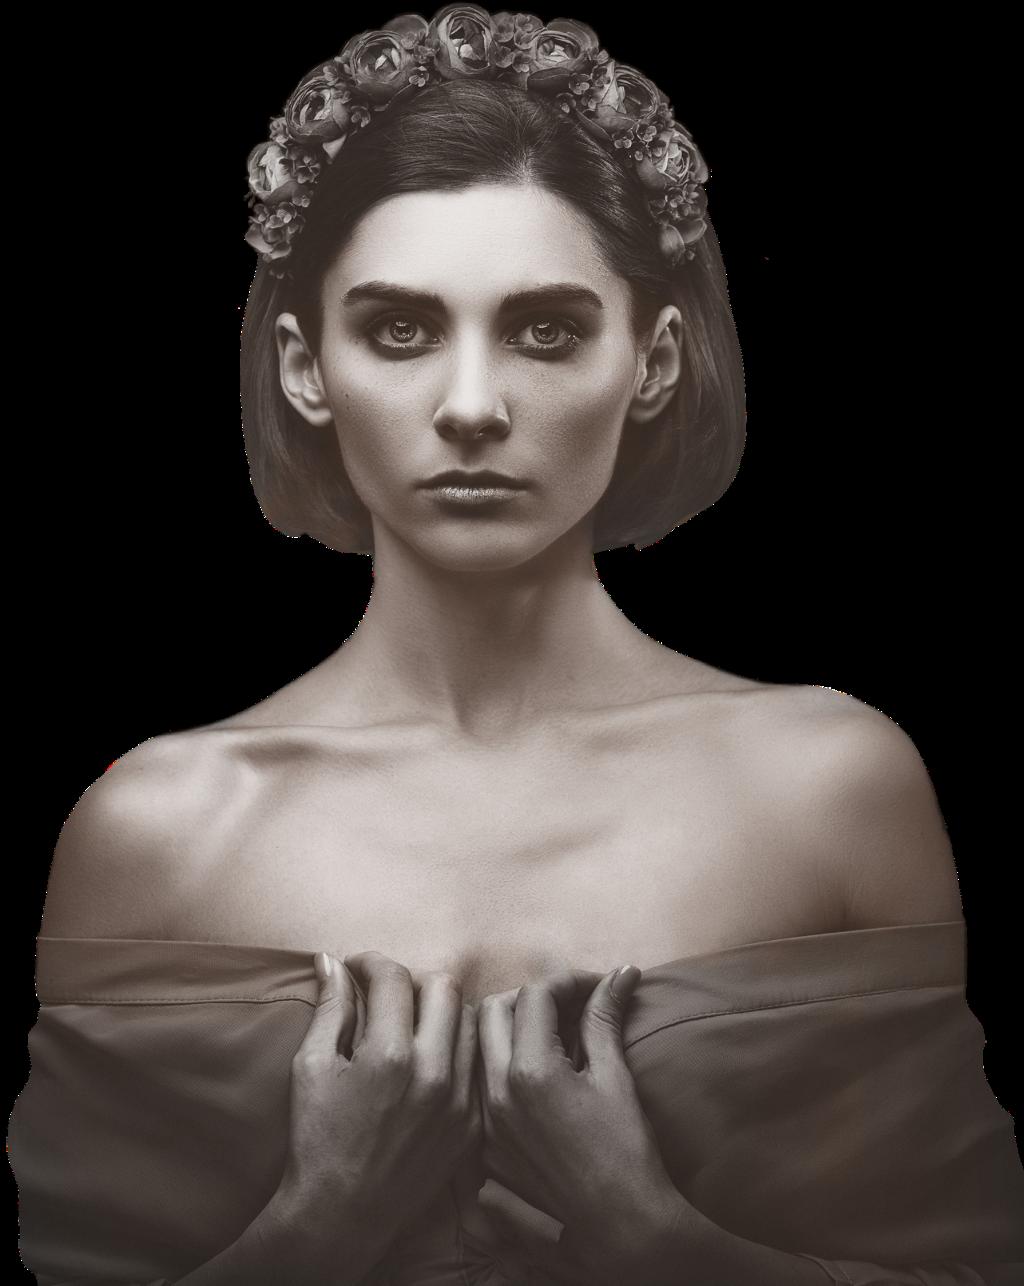 #woman #beauty #aesthetic #portrait #monochrome #madewithpicsart #cutouttool #beautytools